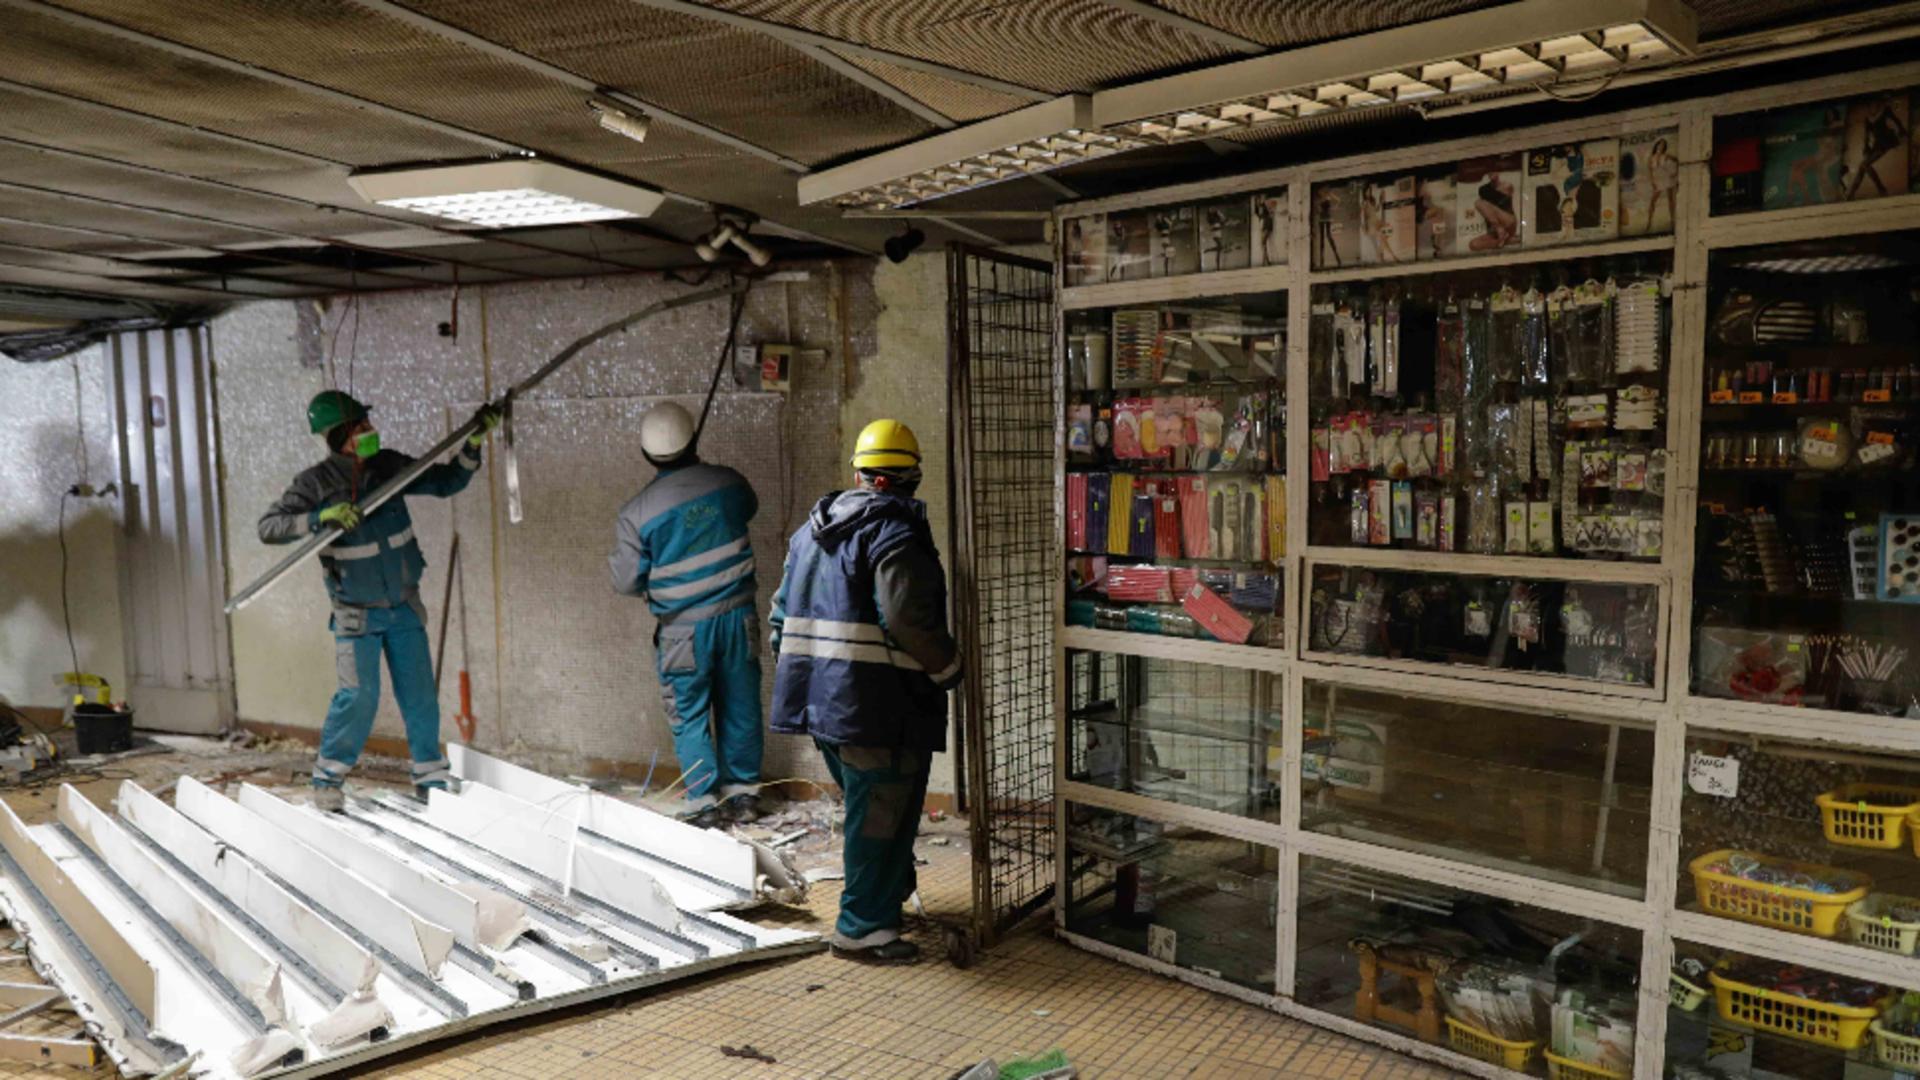 Chioșcuri demolate la metrou / Foto: Arhivă Inquam